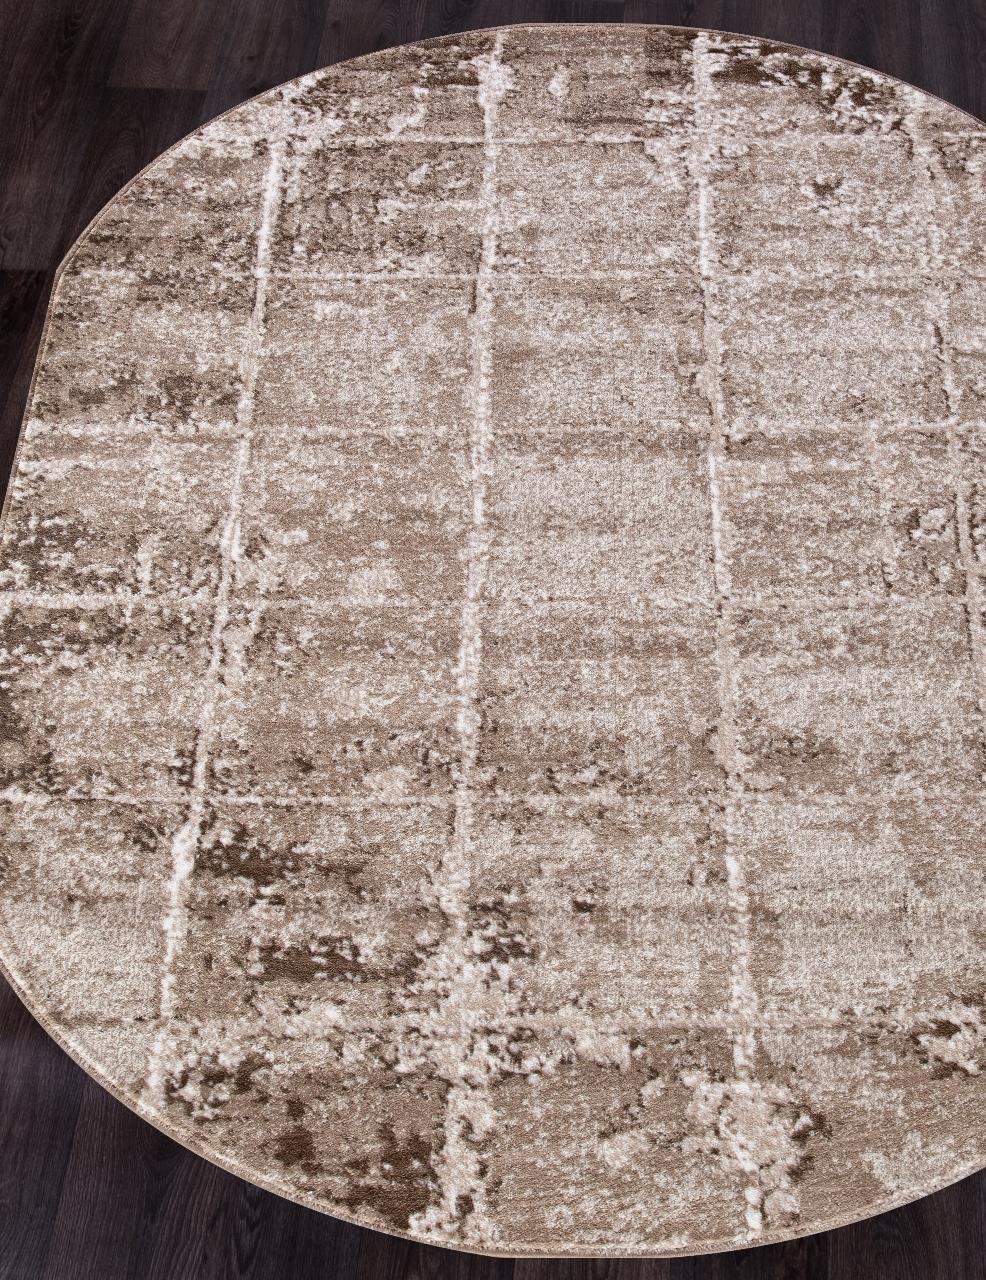 Ковер 1301A - VIZON COKEN / BROWN - Овал - коллекция MARDAN